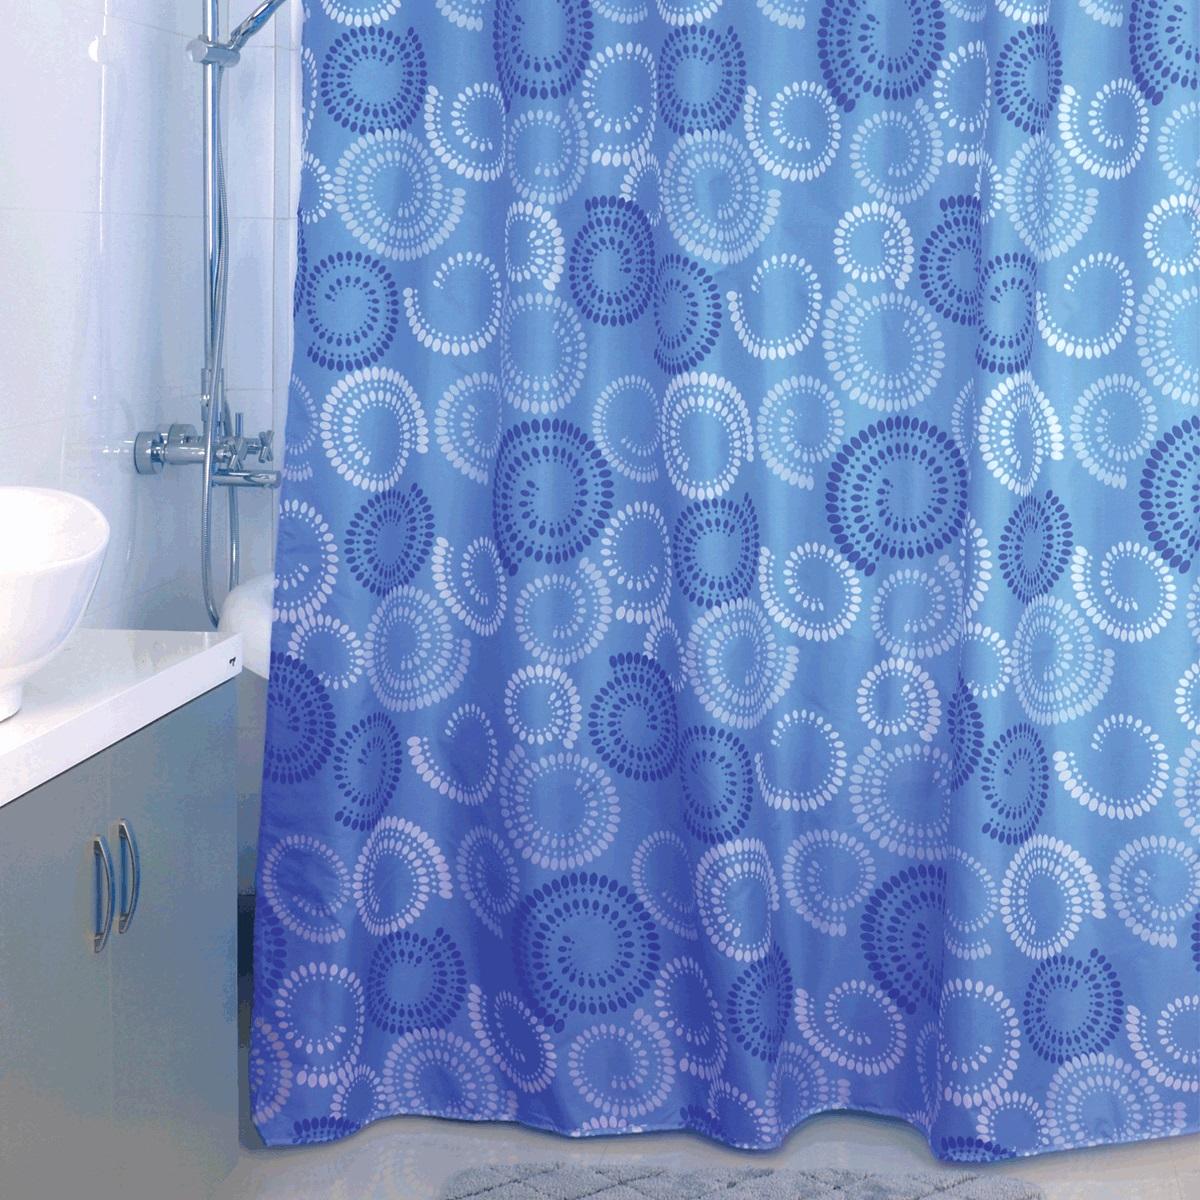 Штора для ванной Milardo Ultramarine Dots, цвет: синий, 180 x 200 см